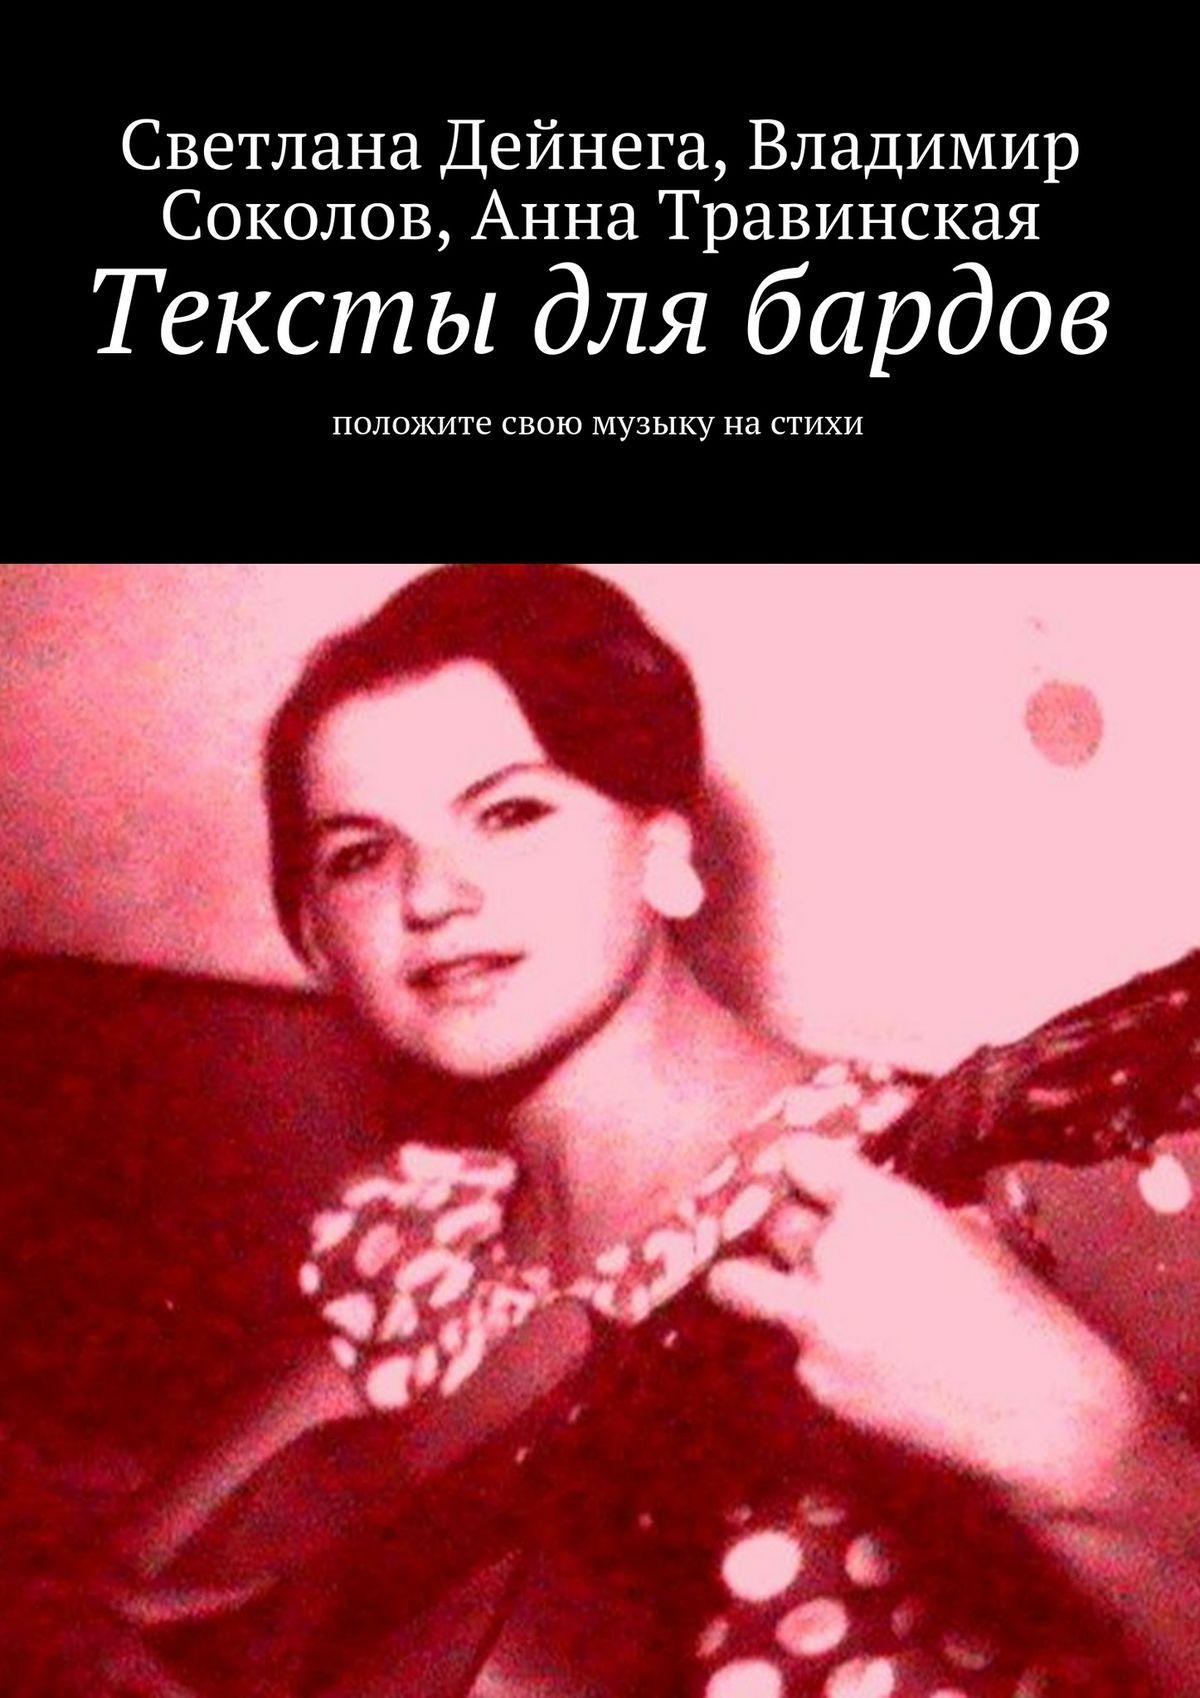 Светлана Петровна Дейнега Тексты для бардов светлана замлелова петровна